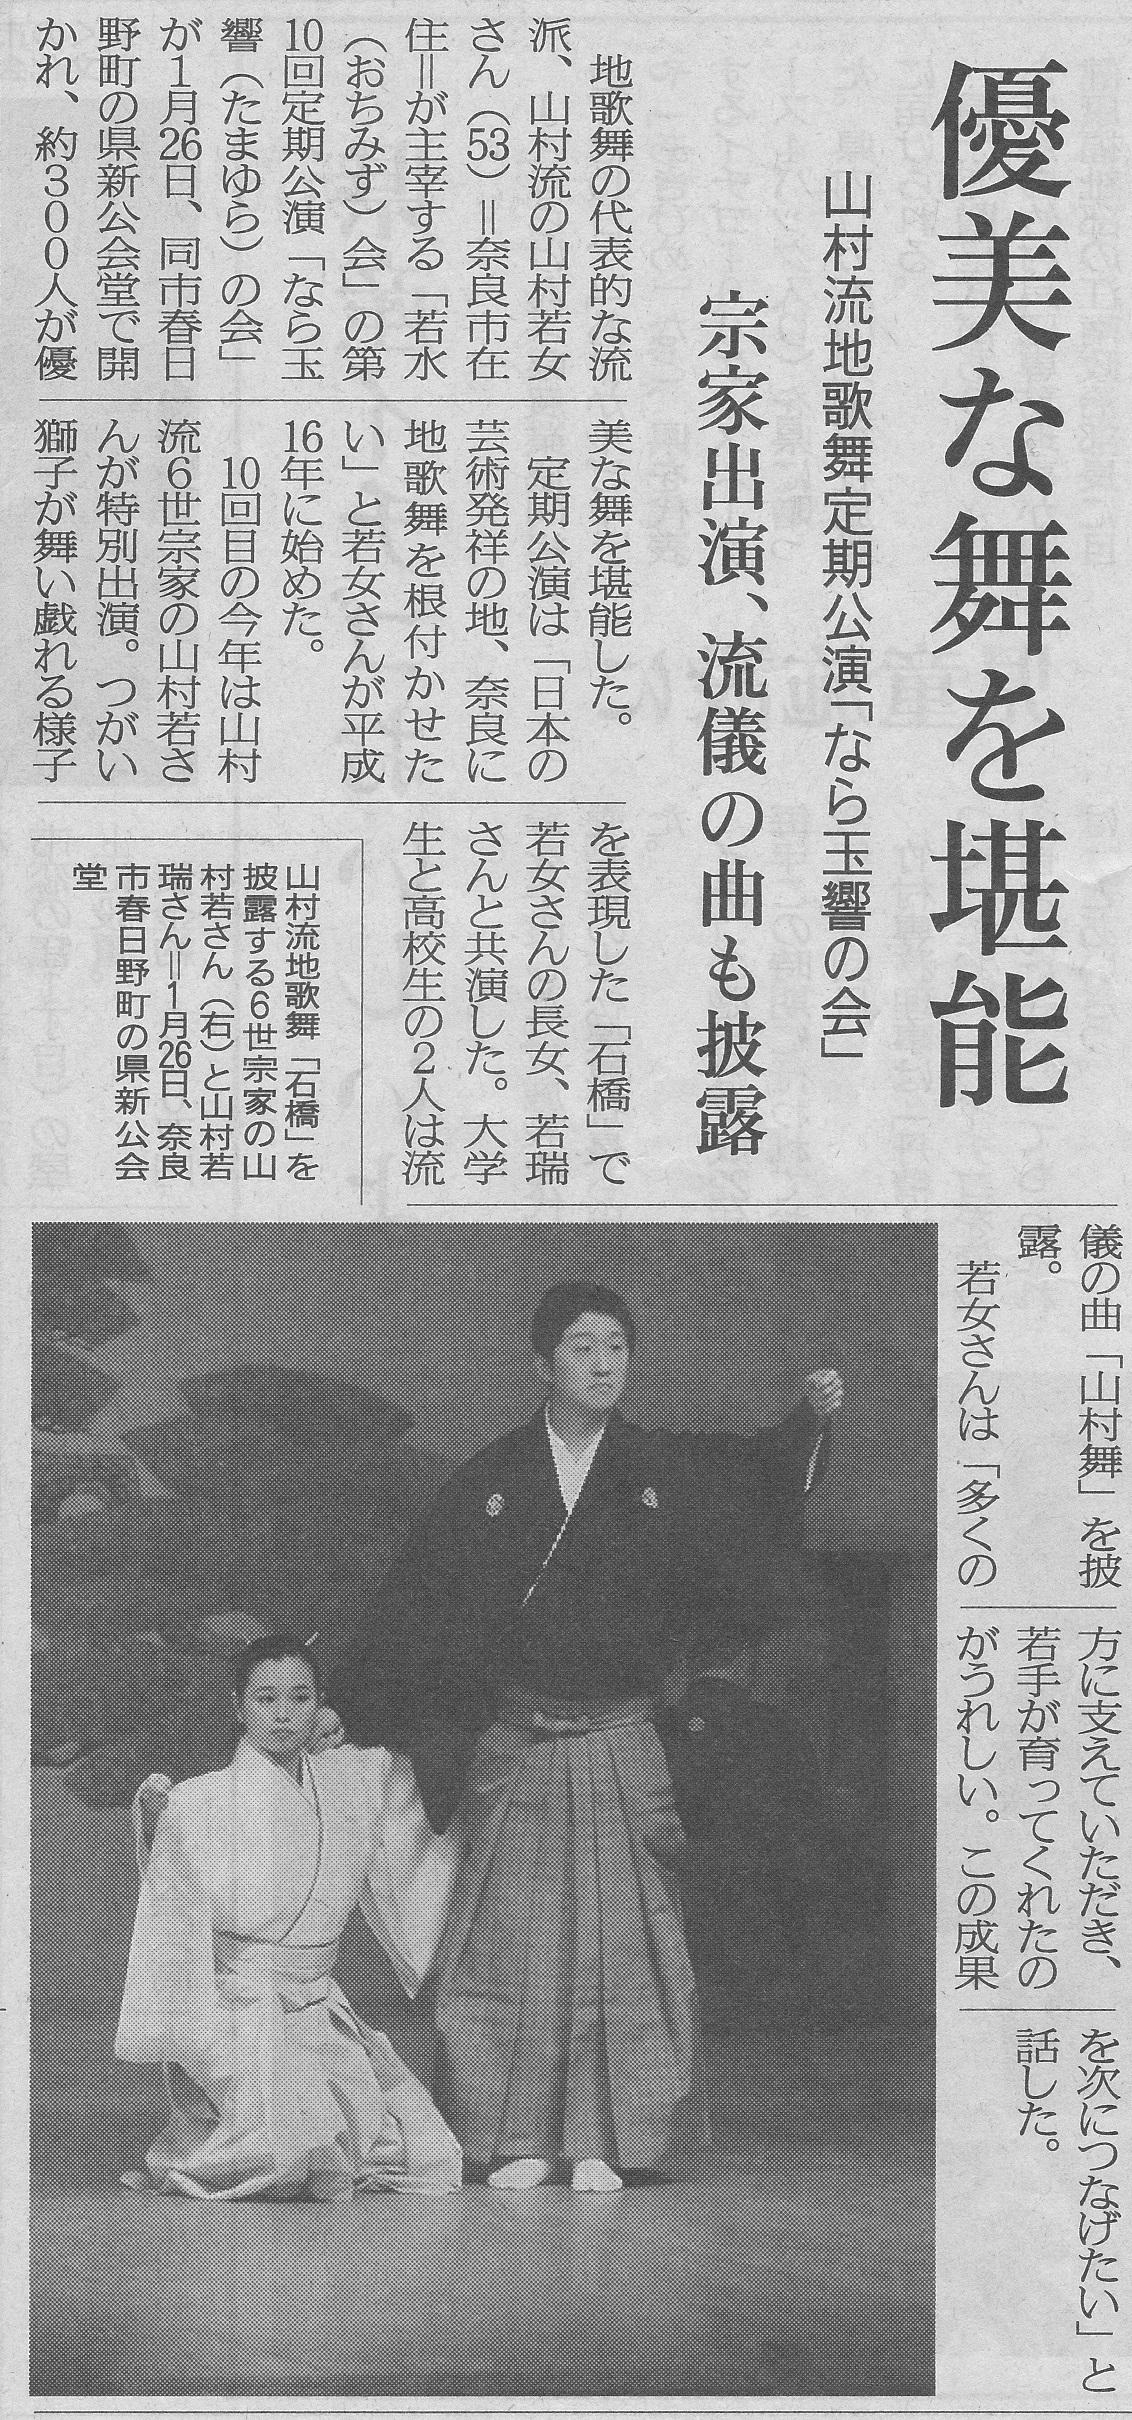 奈良新聞掲載・2014・2・11(玉響の会)